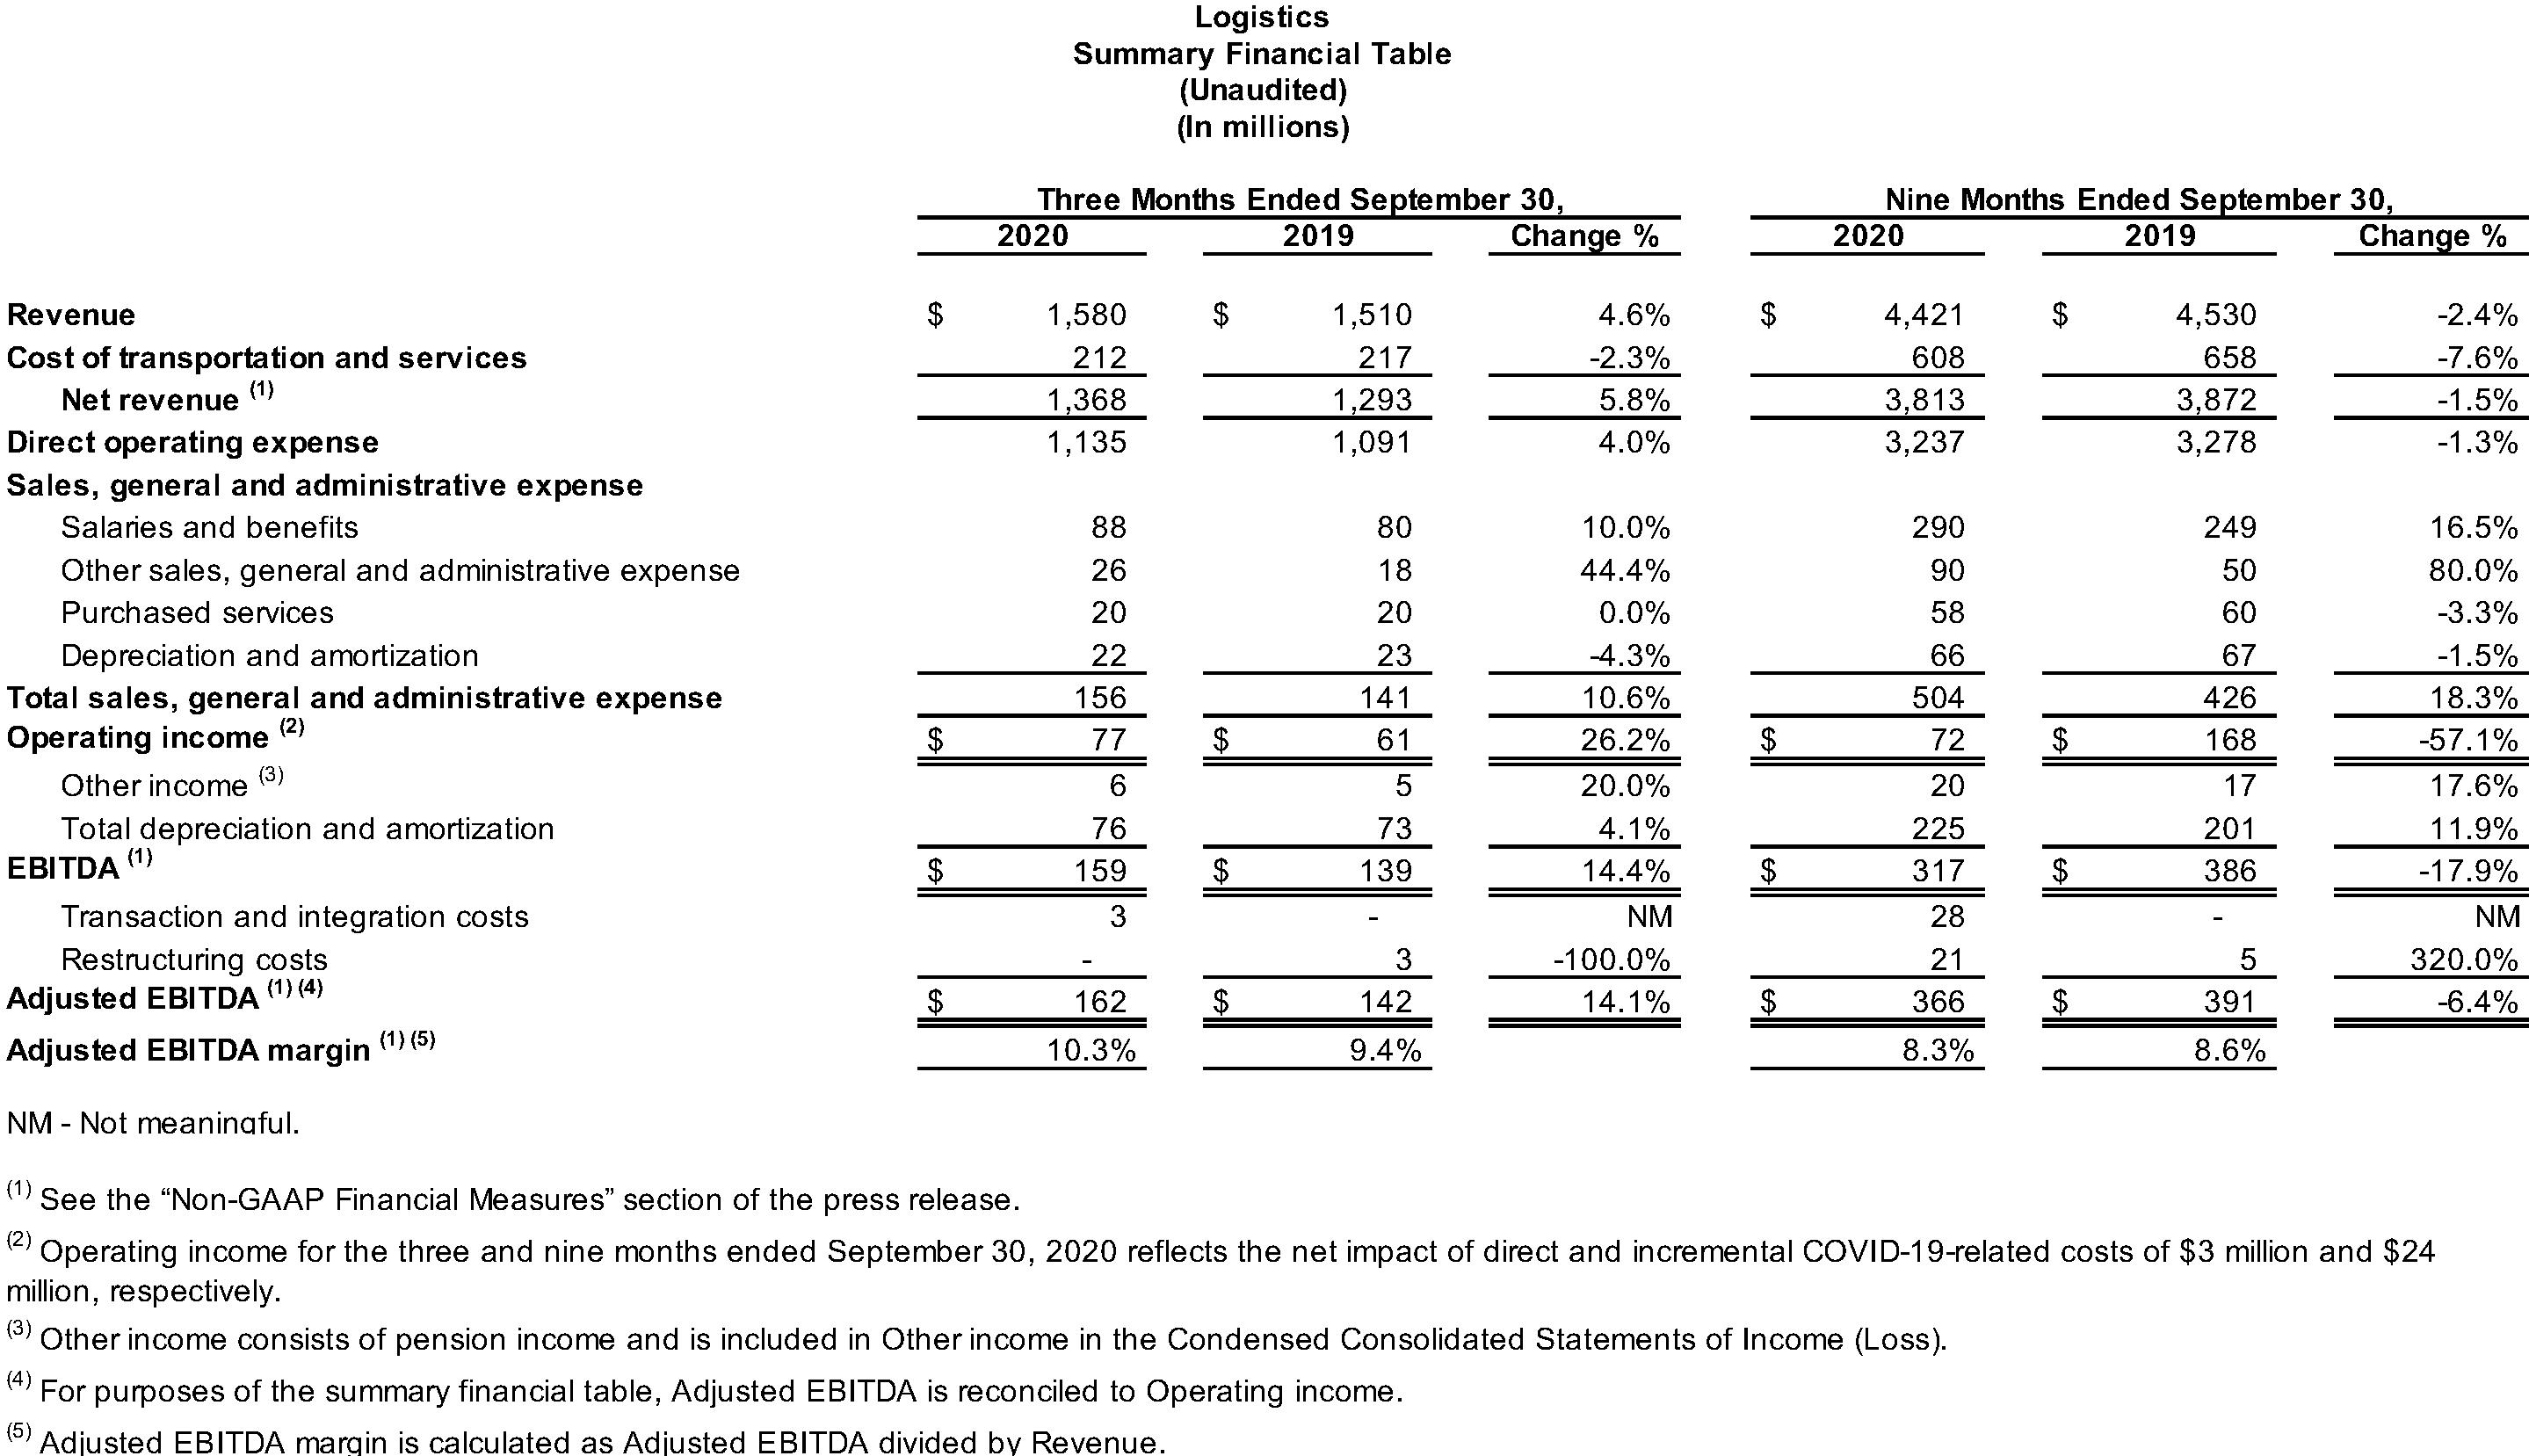 Logistics Summary Financial Table